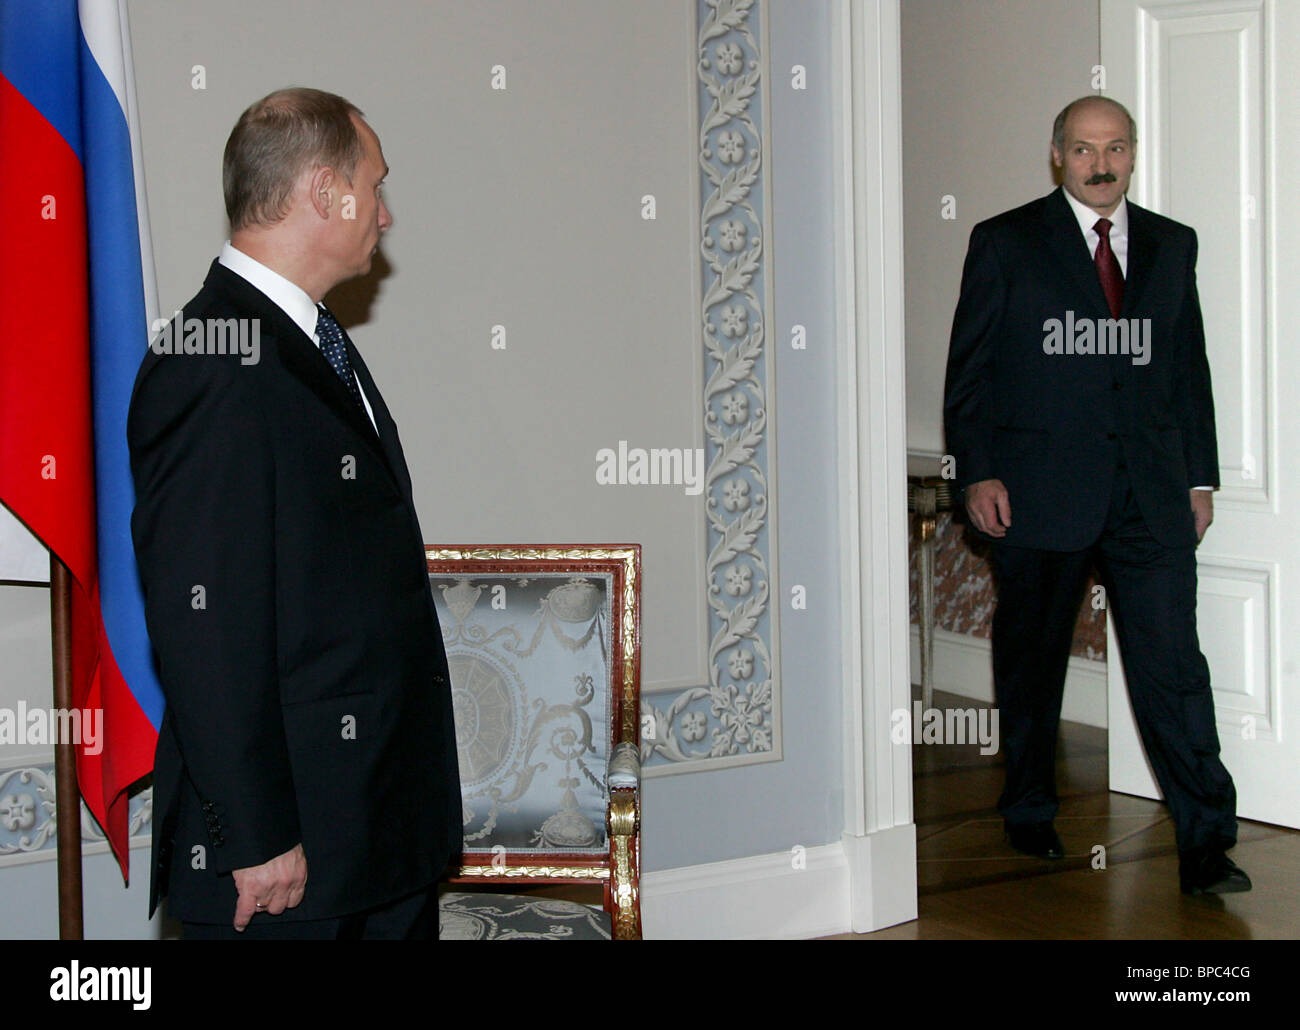 Russian President Vladimir Putin visits St. Petersburg - Stock Image